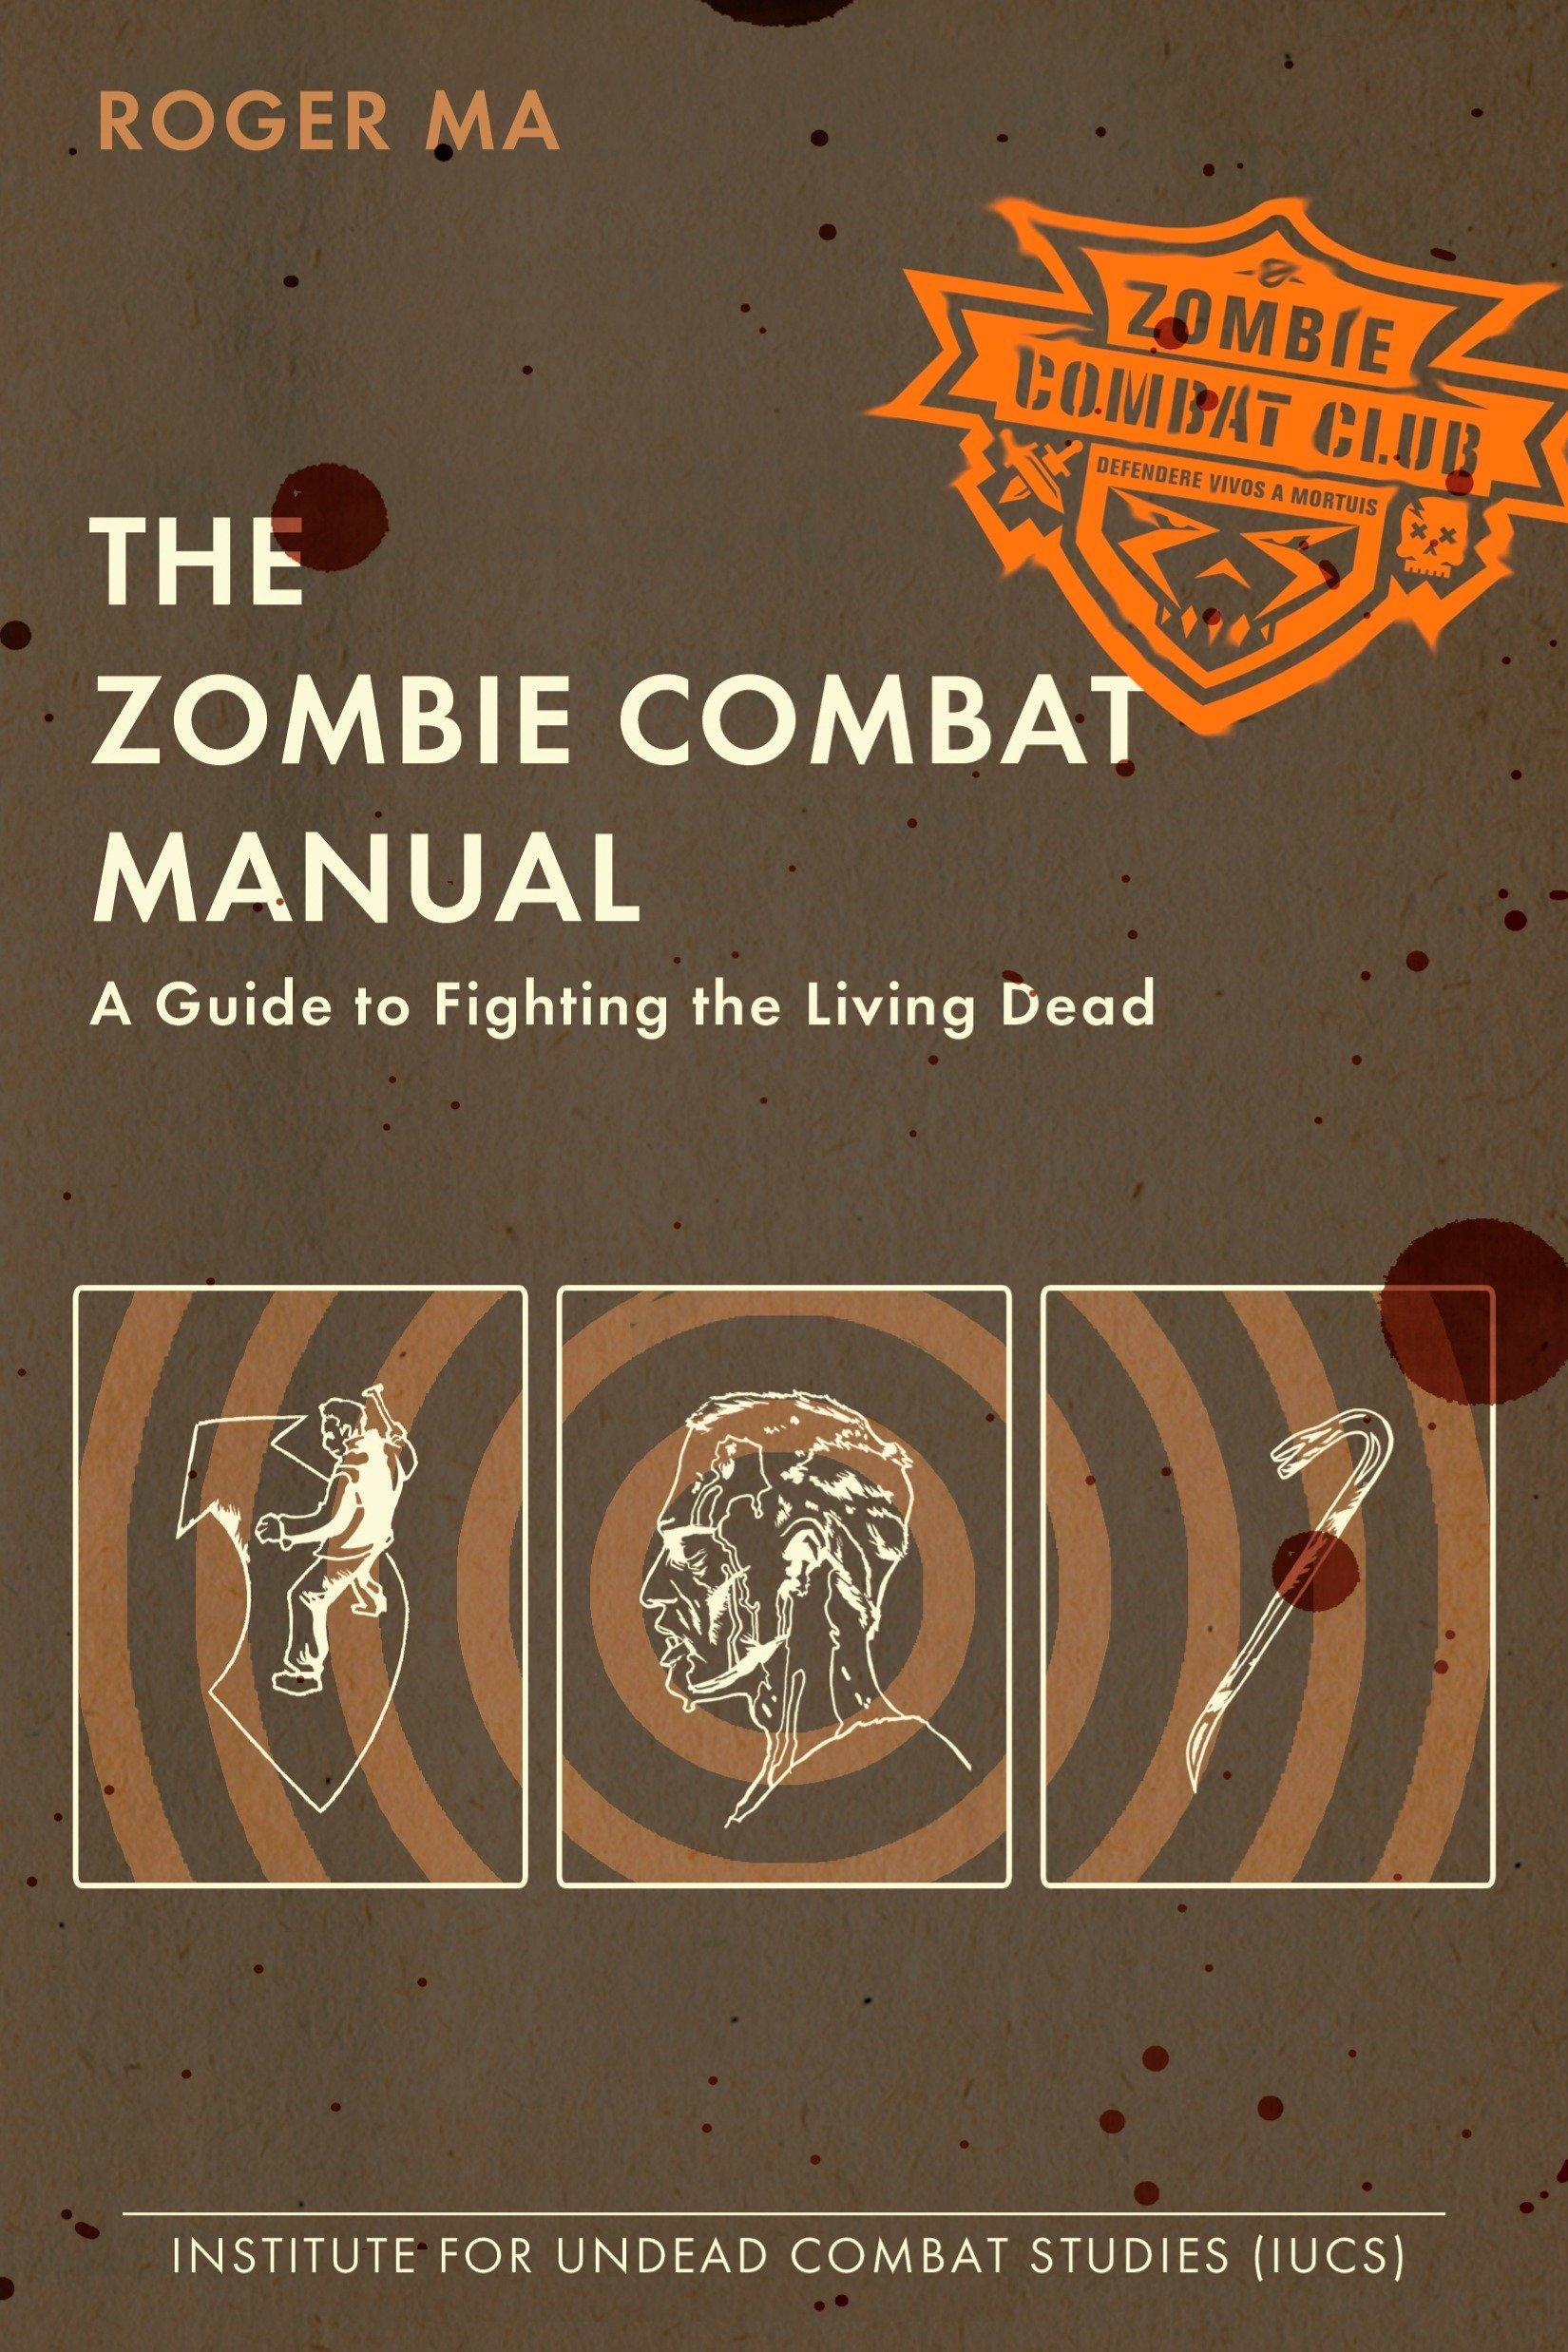 THE ZOMBIE COMBAT MANUAL EPUB